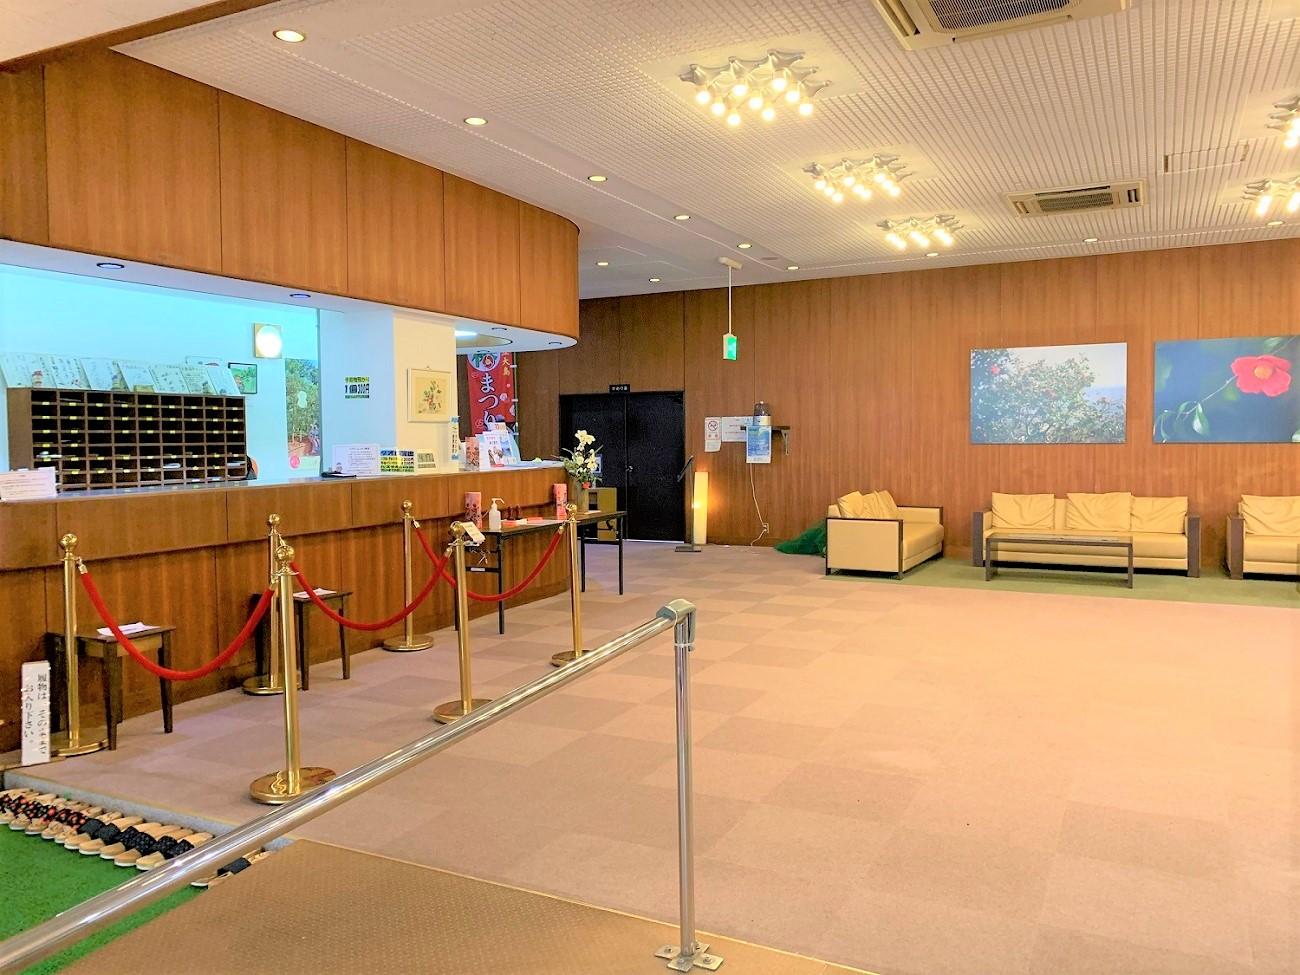 三原山温泉・大島温泉ホテル